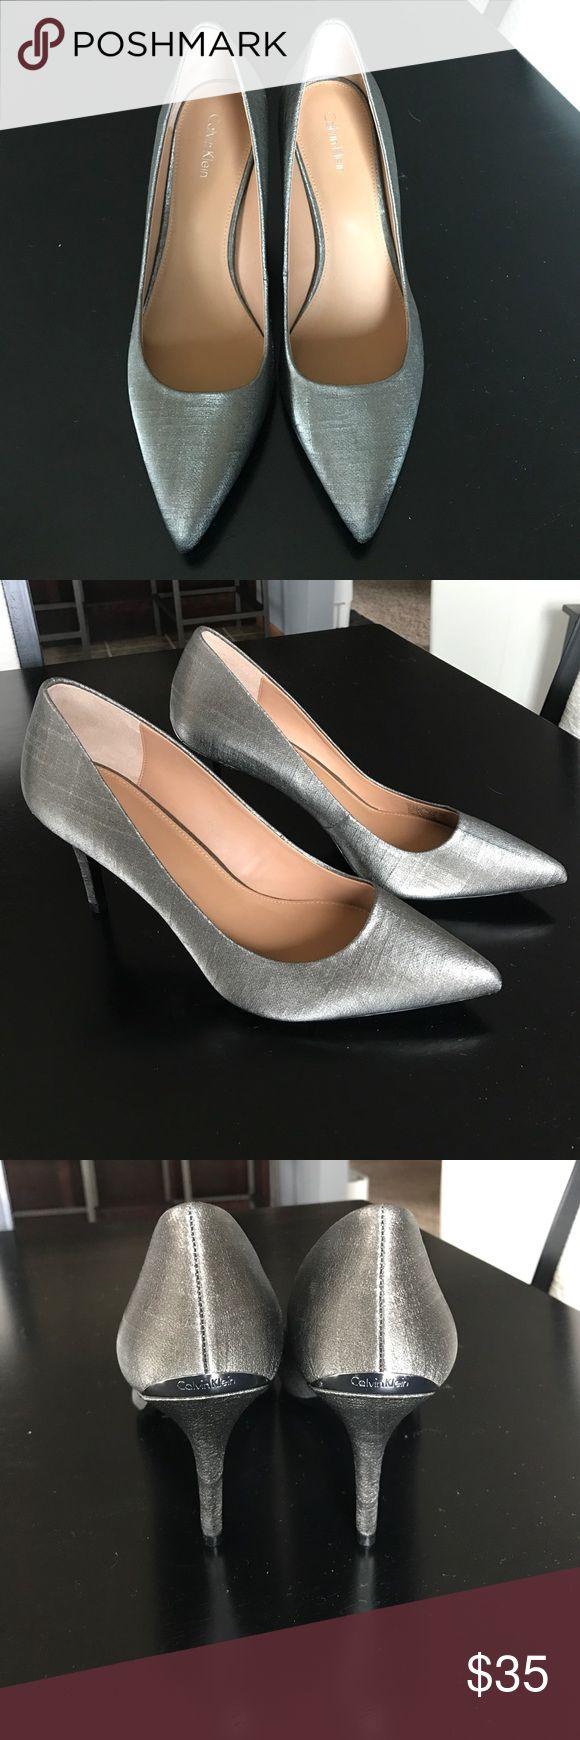 "Calvin Klein Gayle metallic pump Metallic silver pump. Like new condition! Just over 3"" heel. Calvin Klein Shoes Heels"